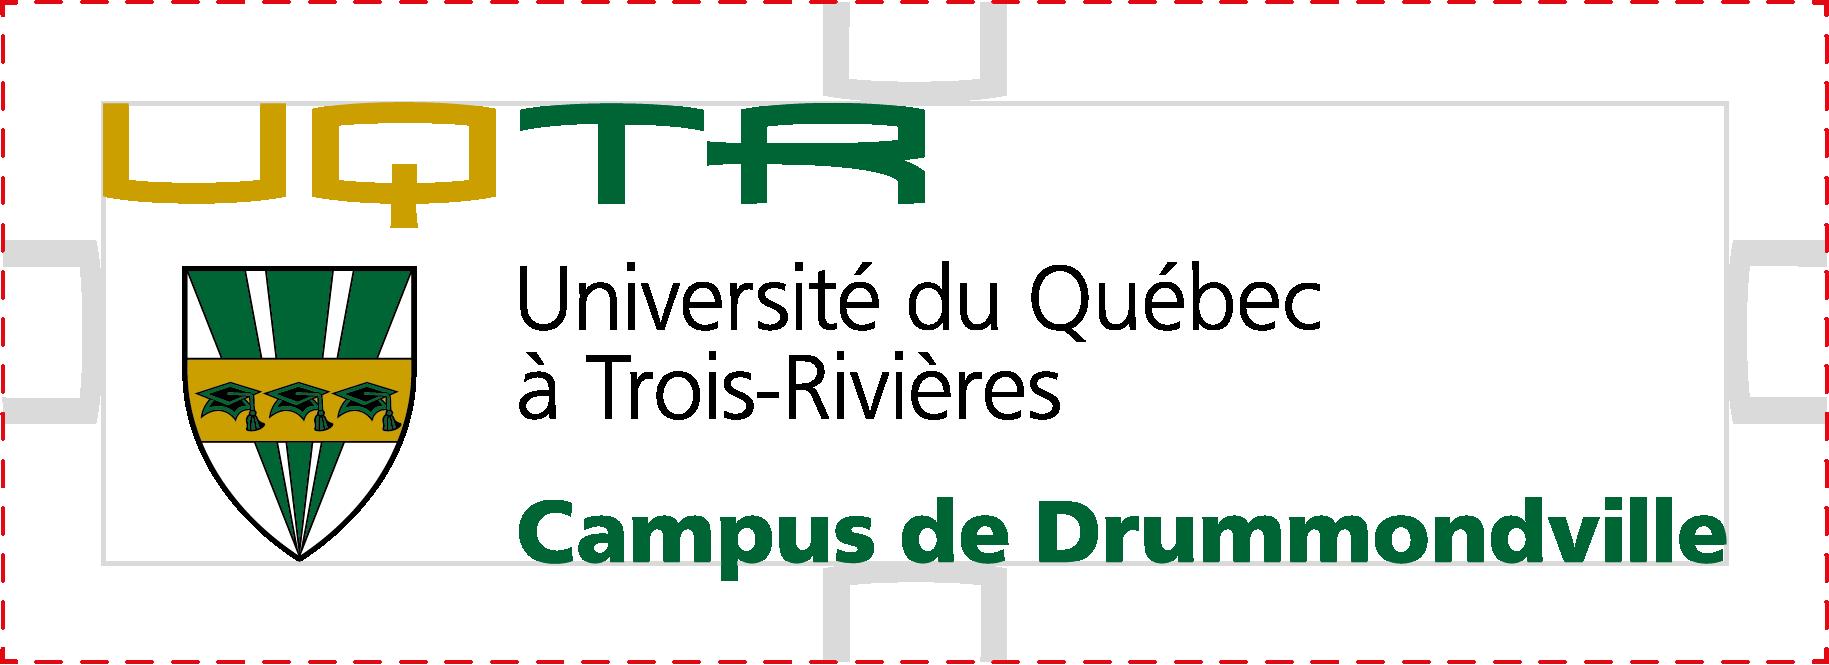 Espace de protection logo horizontal